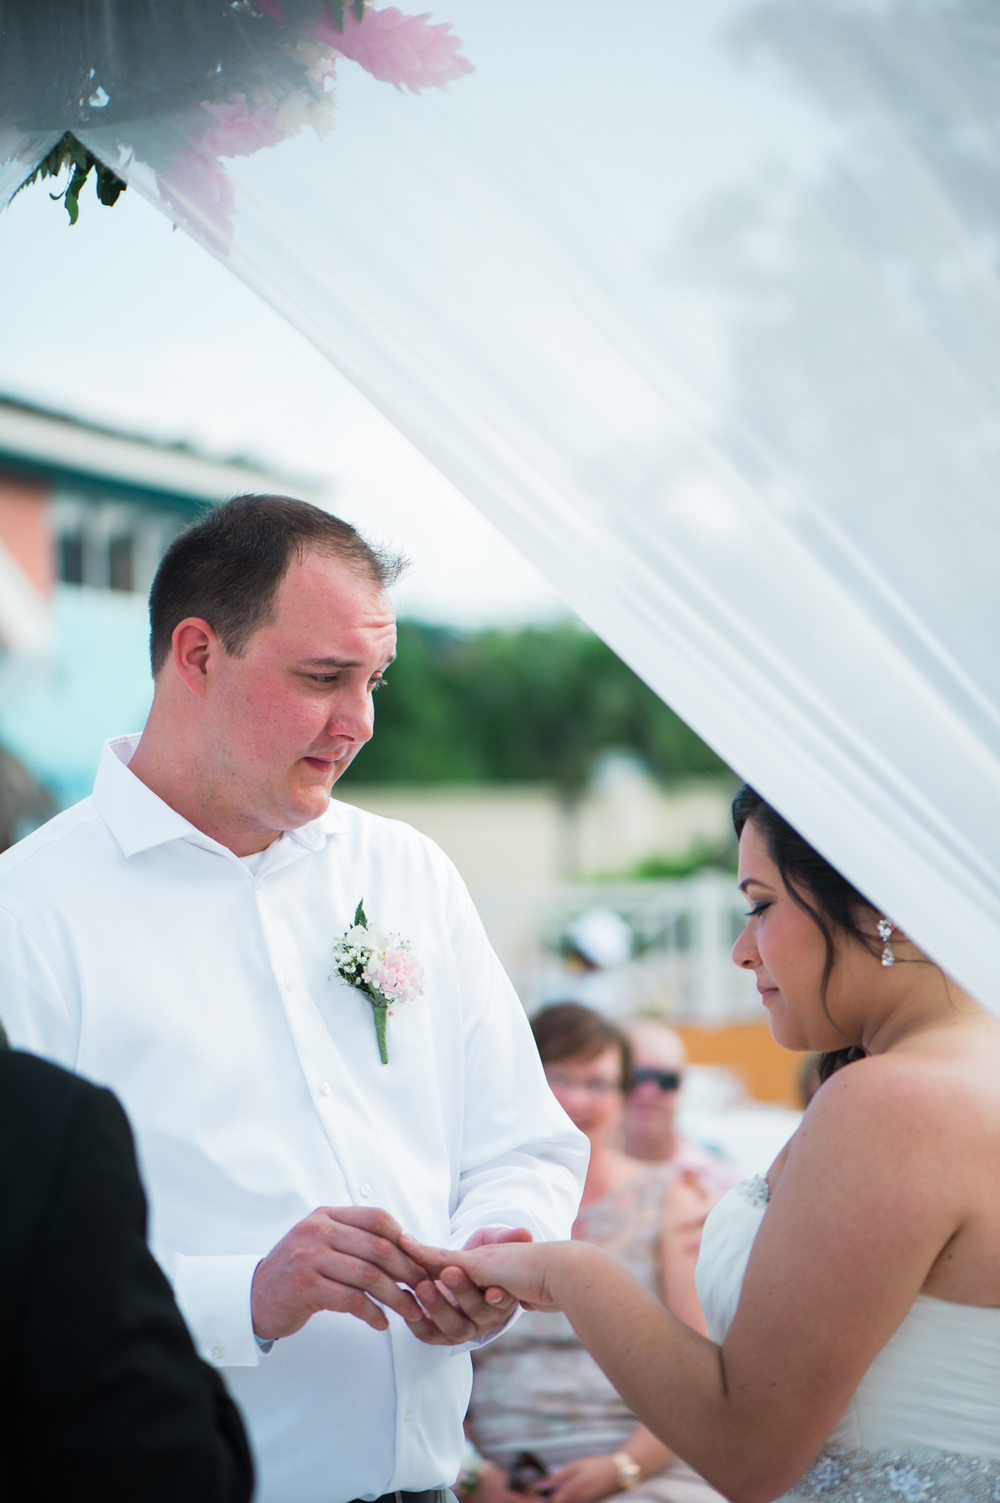 JadeandRyan-Montego-Bay-Jamaica-Wedding-Iberostar-Resort-Beach-56.jpg